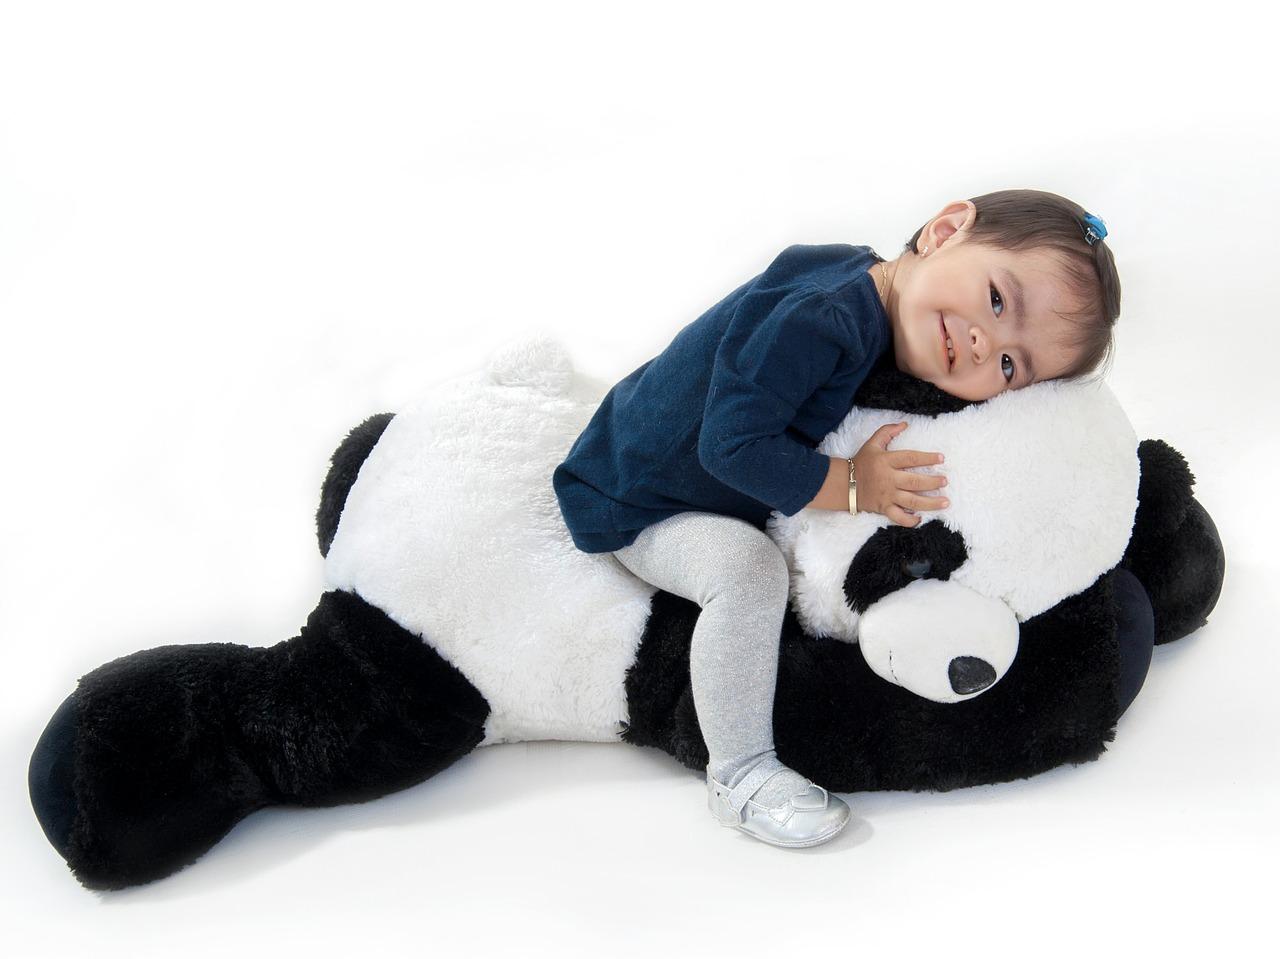 Воспитание ребенка от 1 года до 3 лет